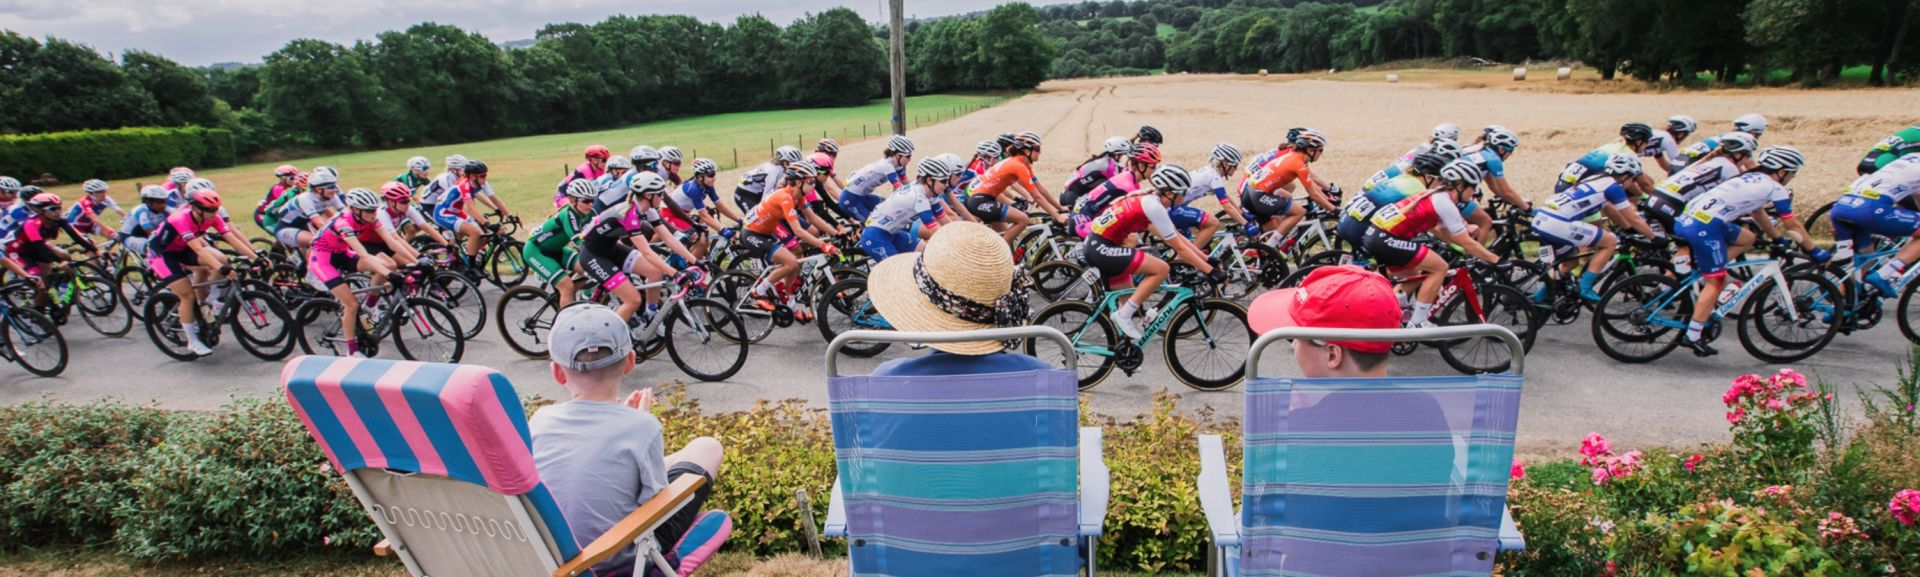 Sportbreizh Tout En Cyclisme Et Le Bretagne Cyclotourisme 1lKcJF